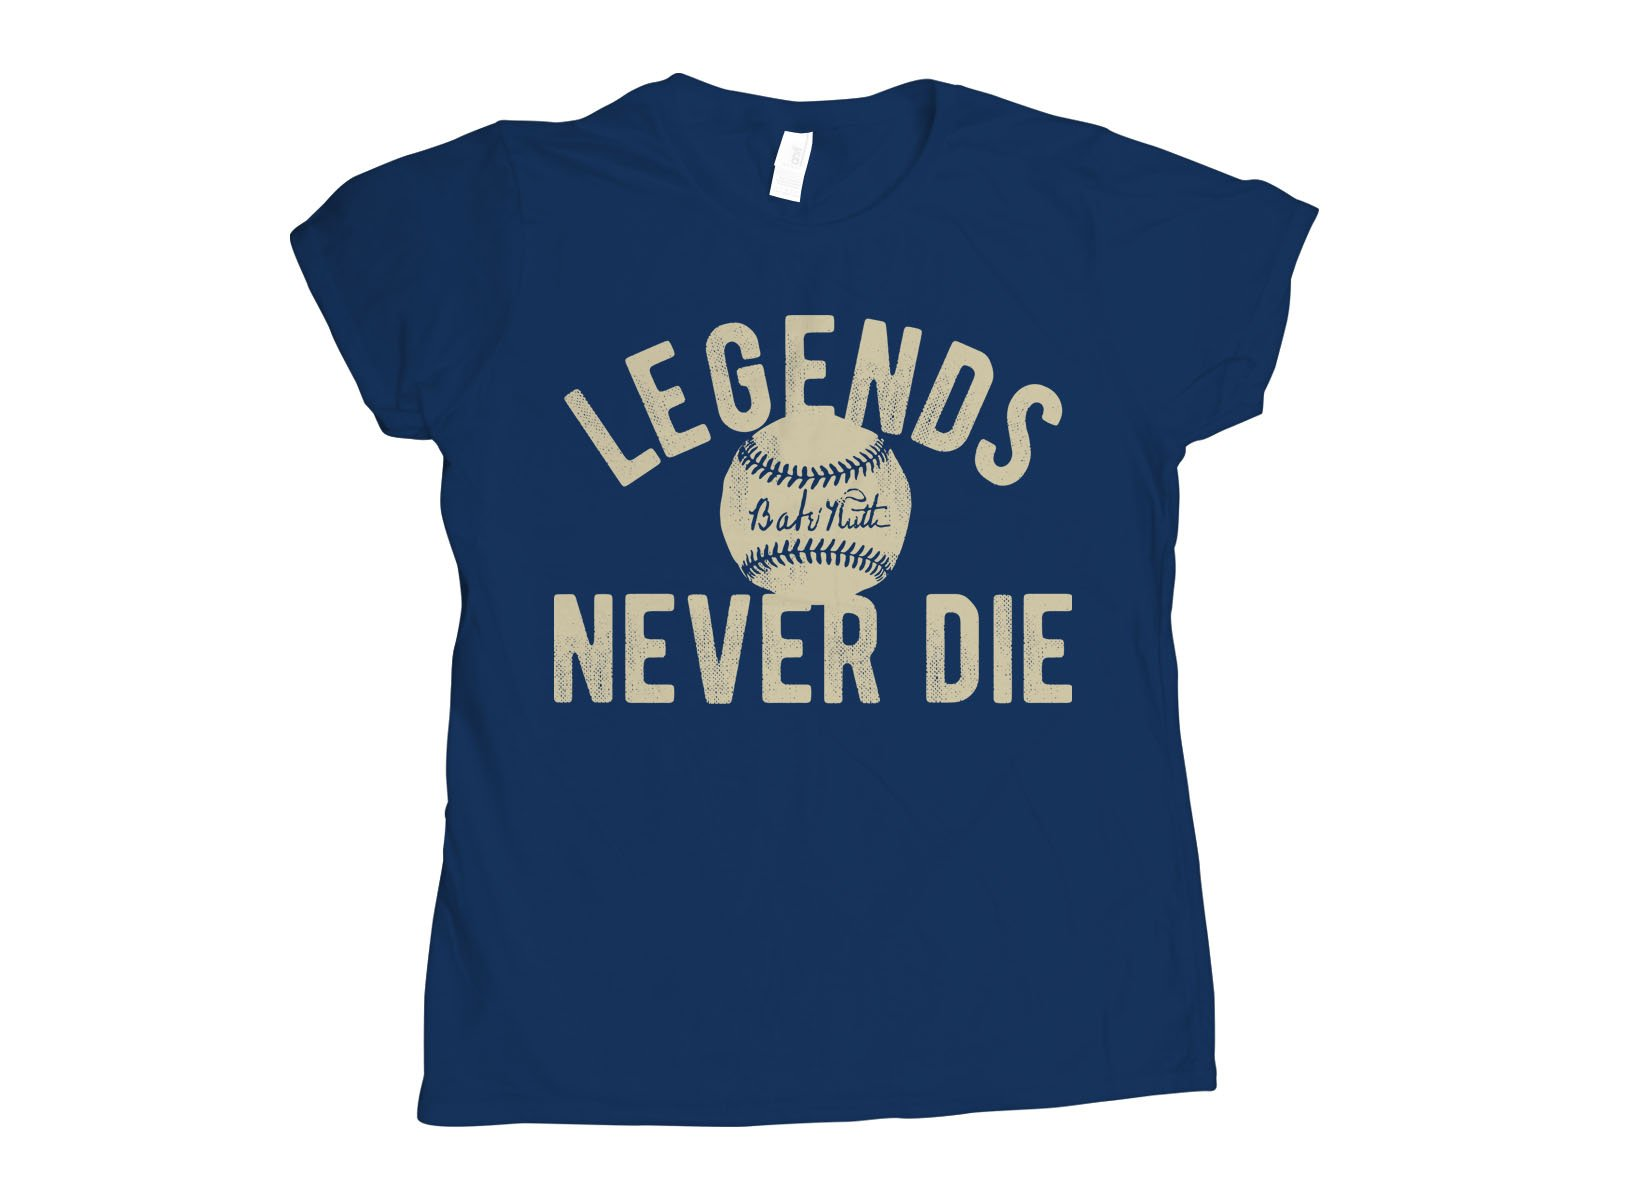 Legends Never Die on Womens T-Shirt